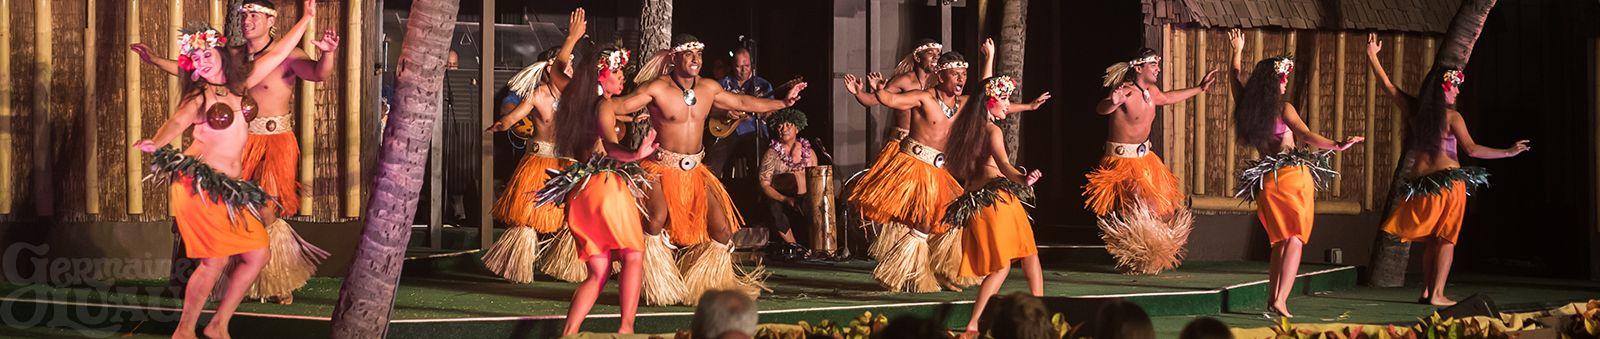 Pricing for Luau Events Hawaii | Traditional Hula Honolulu